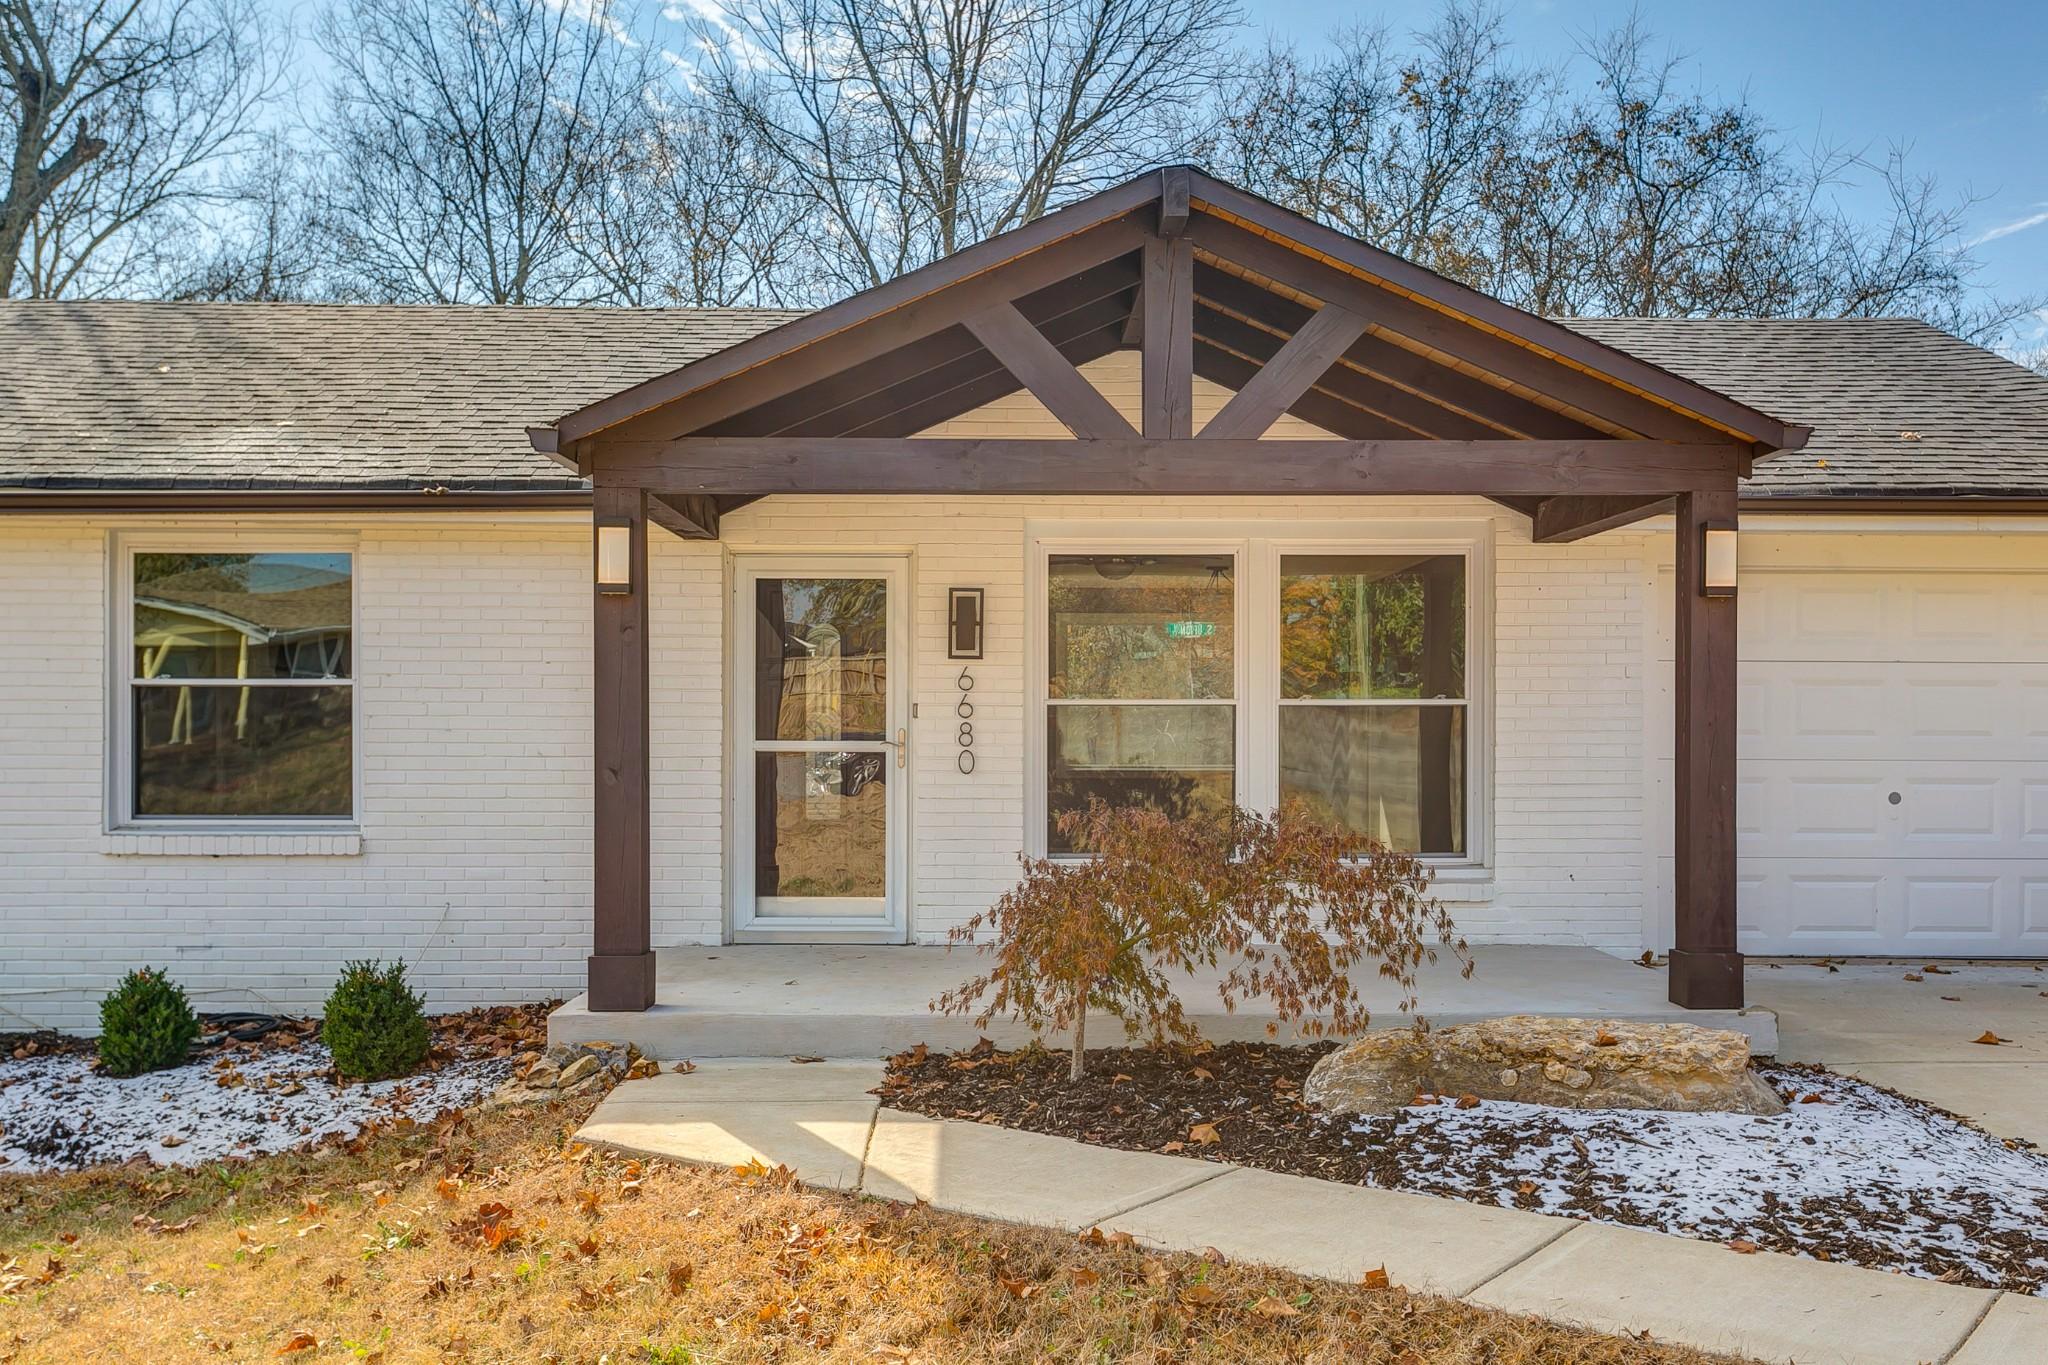 6680 S Upton Ct, Nashville, TN 37209 - Nashville, TN real estate listing